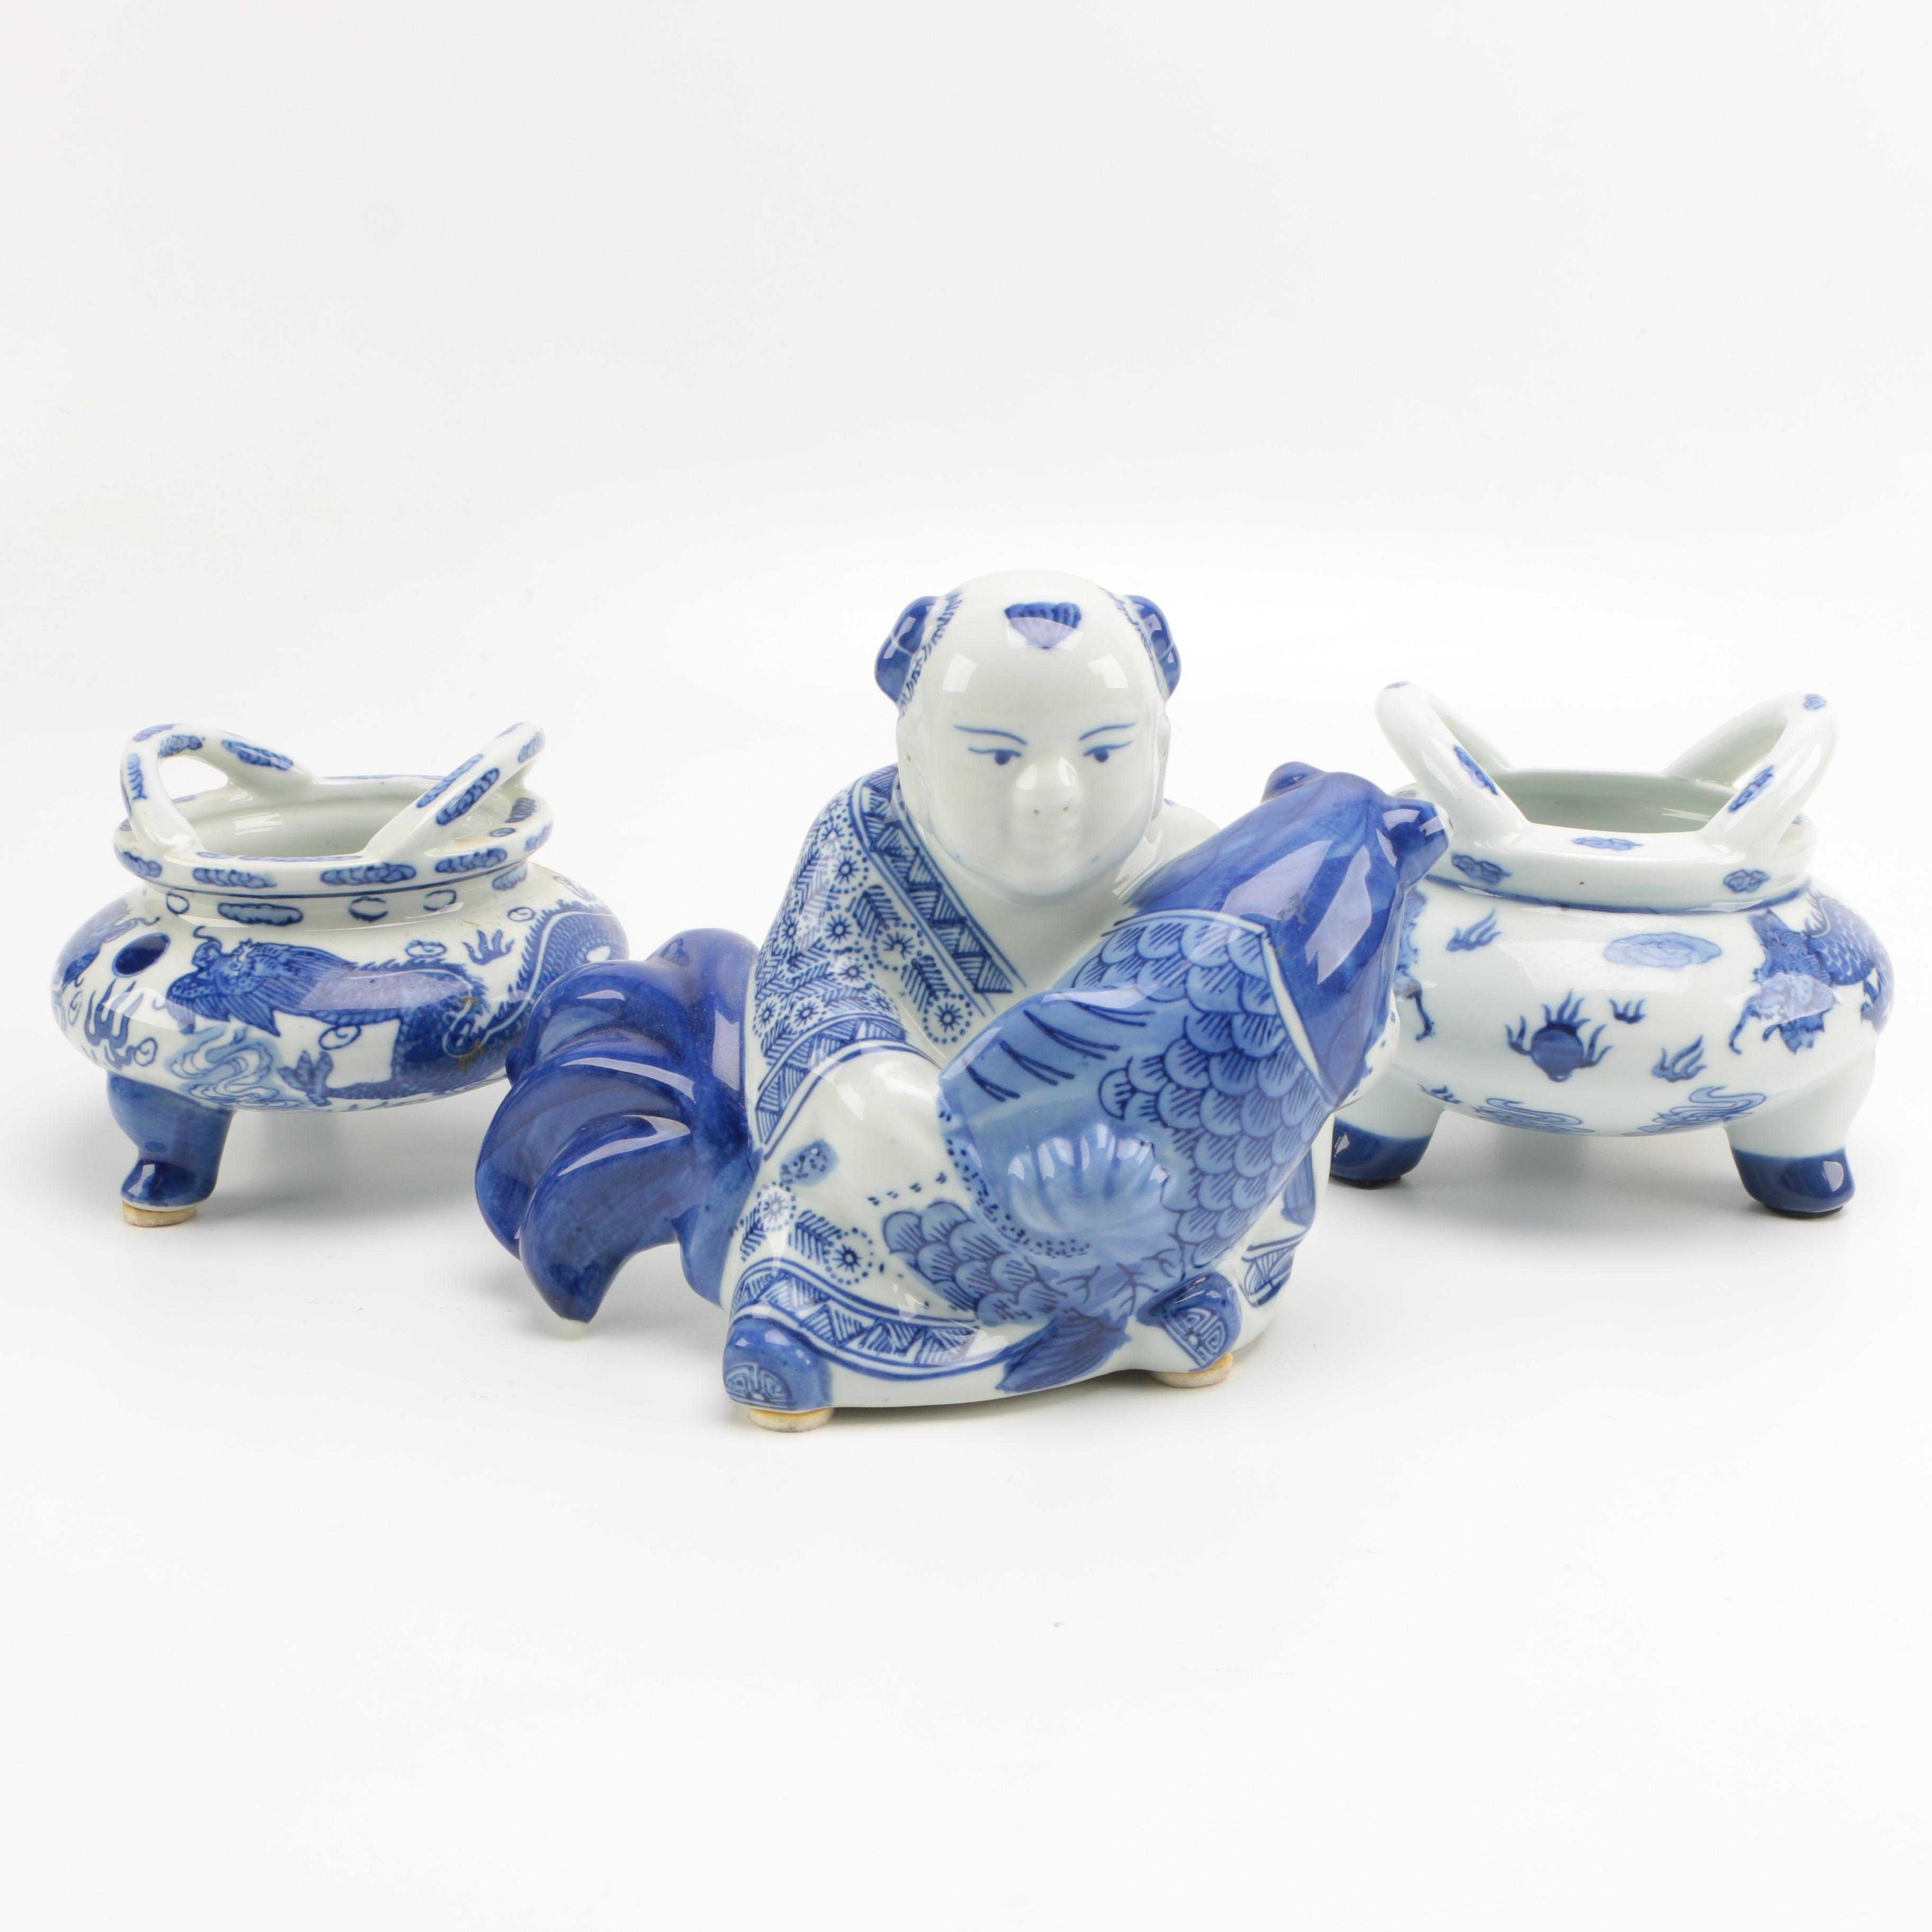 Chinese Ceramic Home Decor